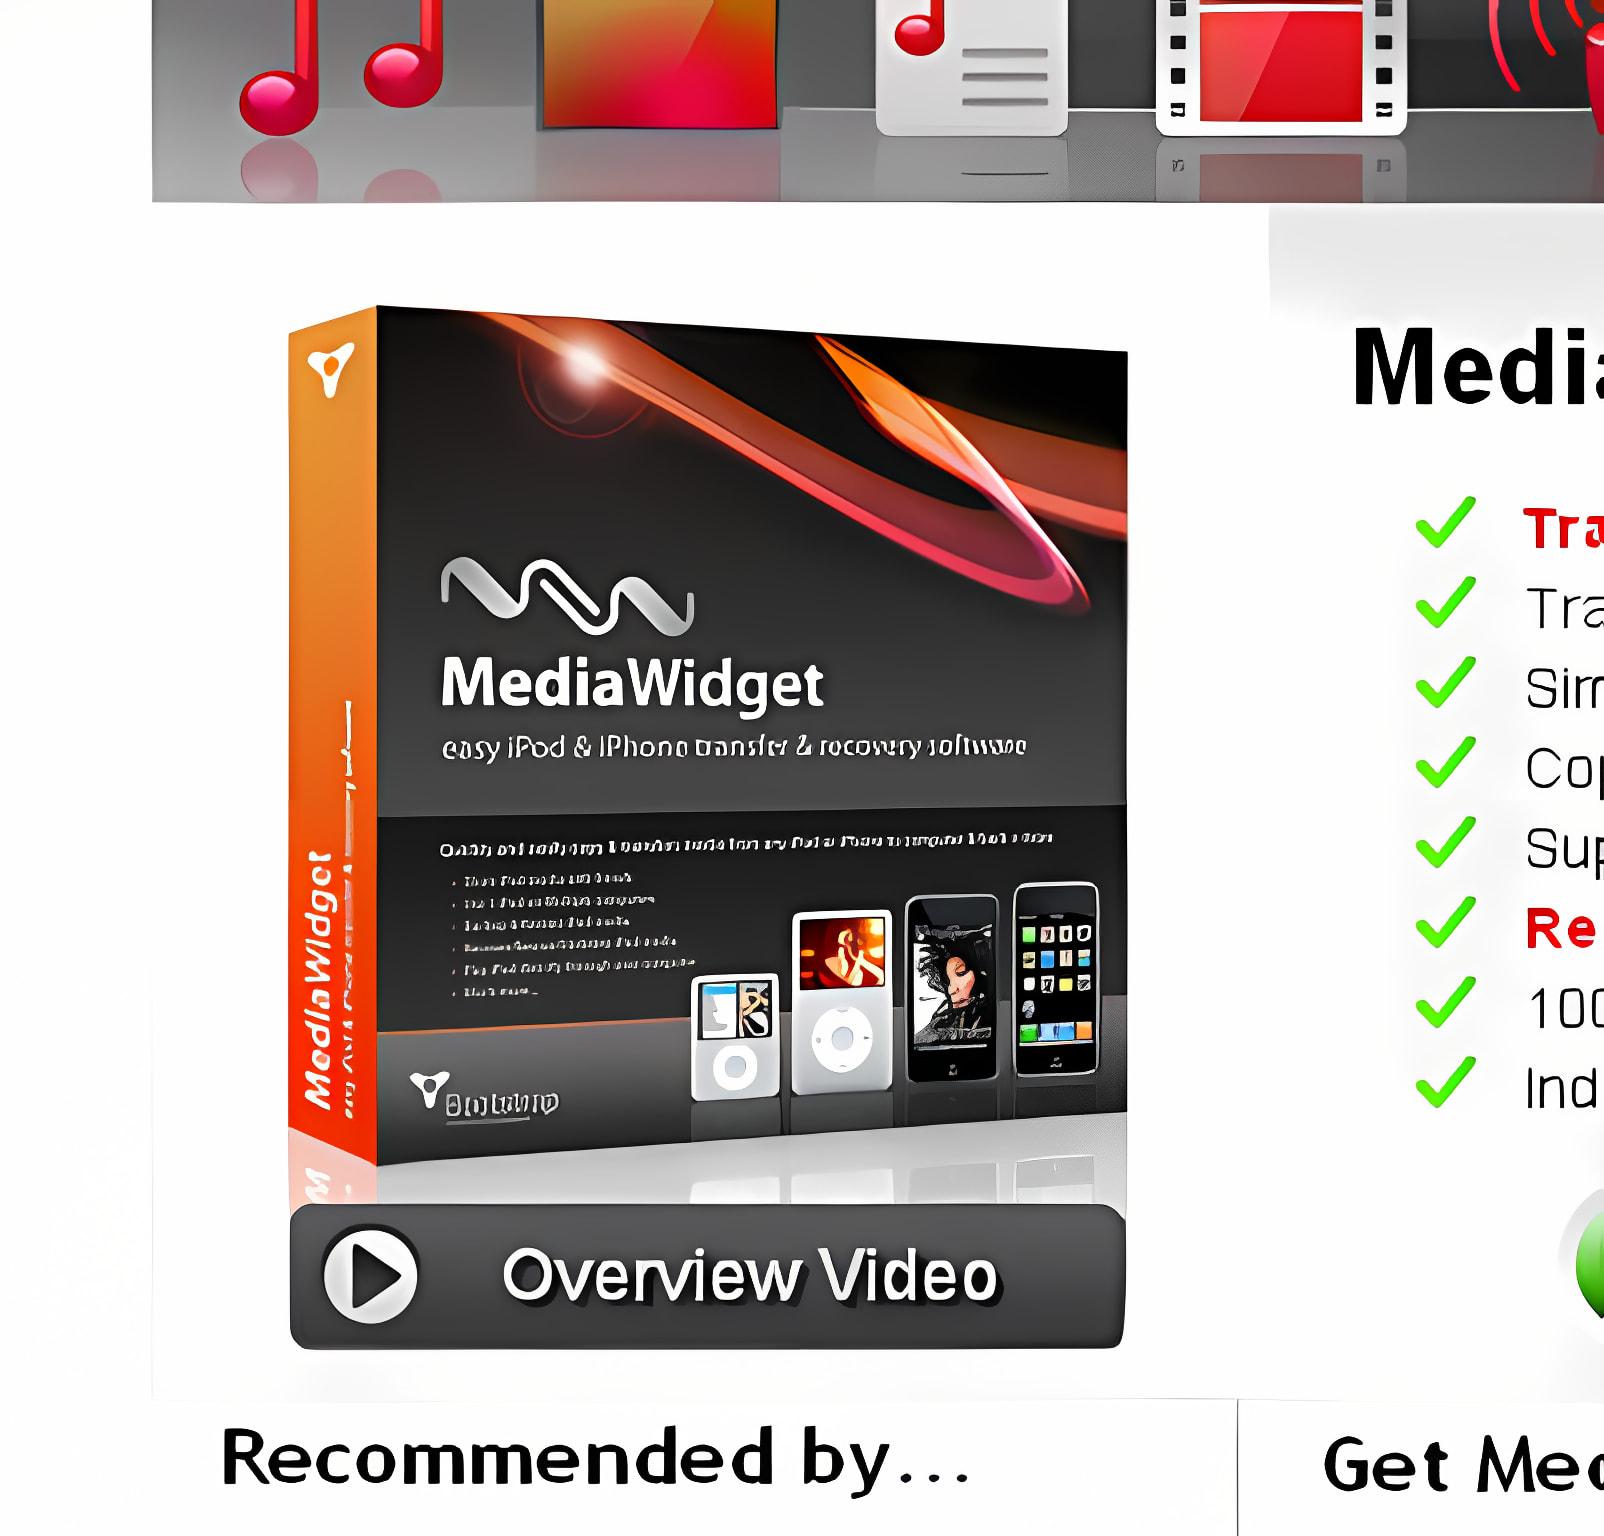 MediaWidget - Easy iPod Transfer